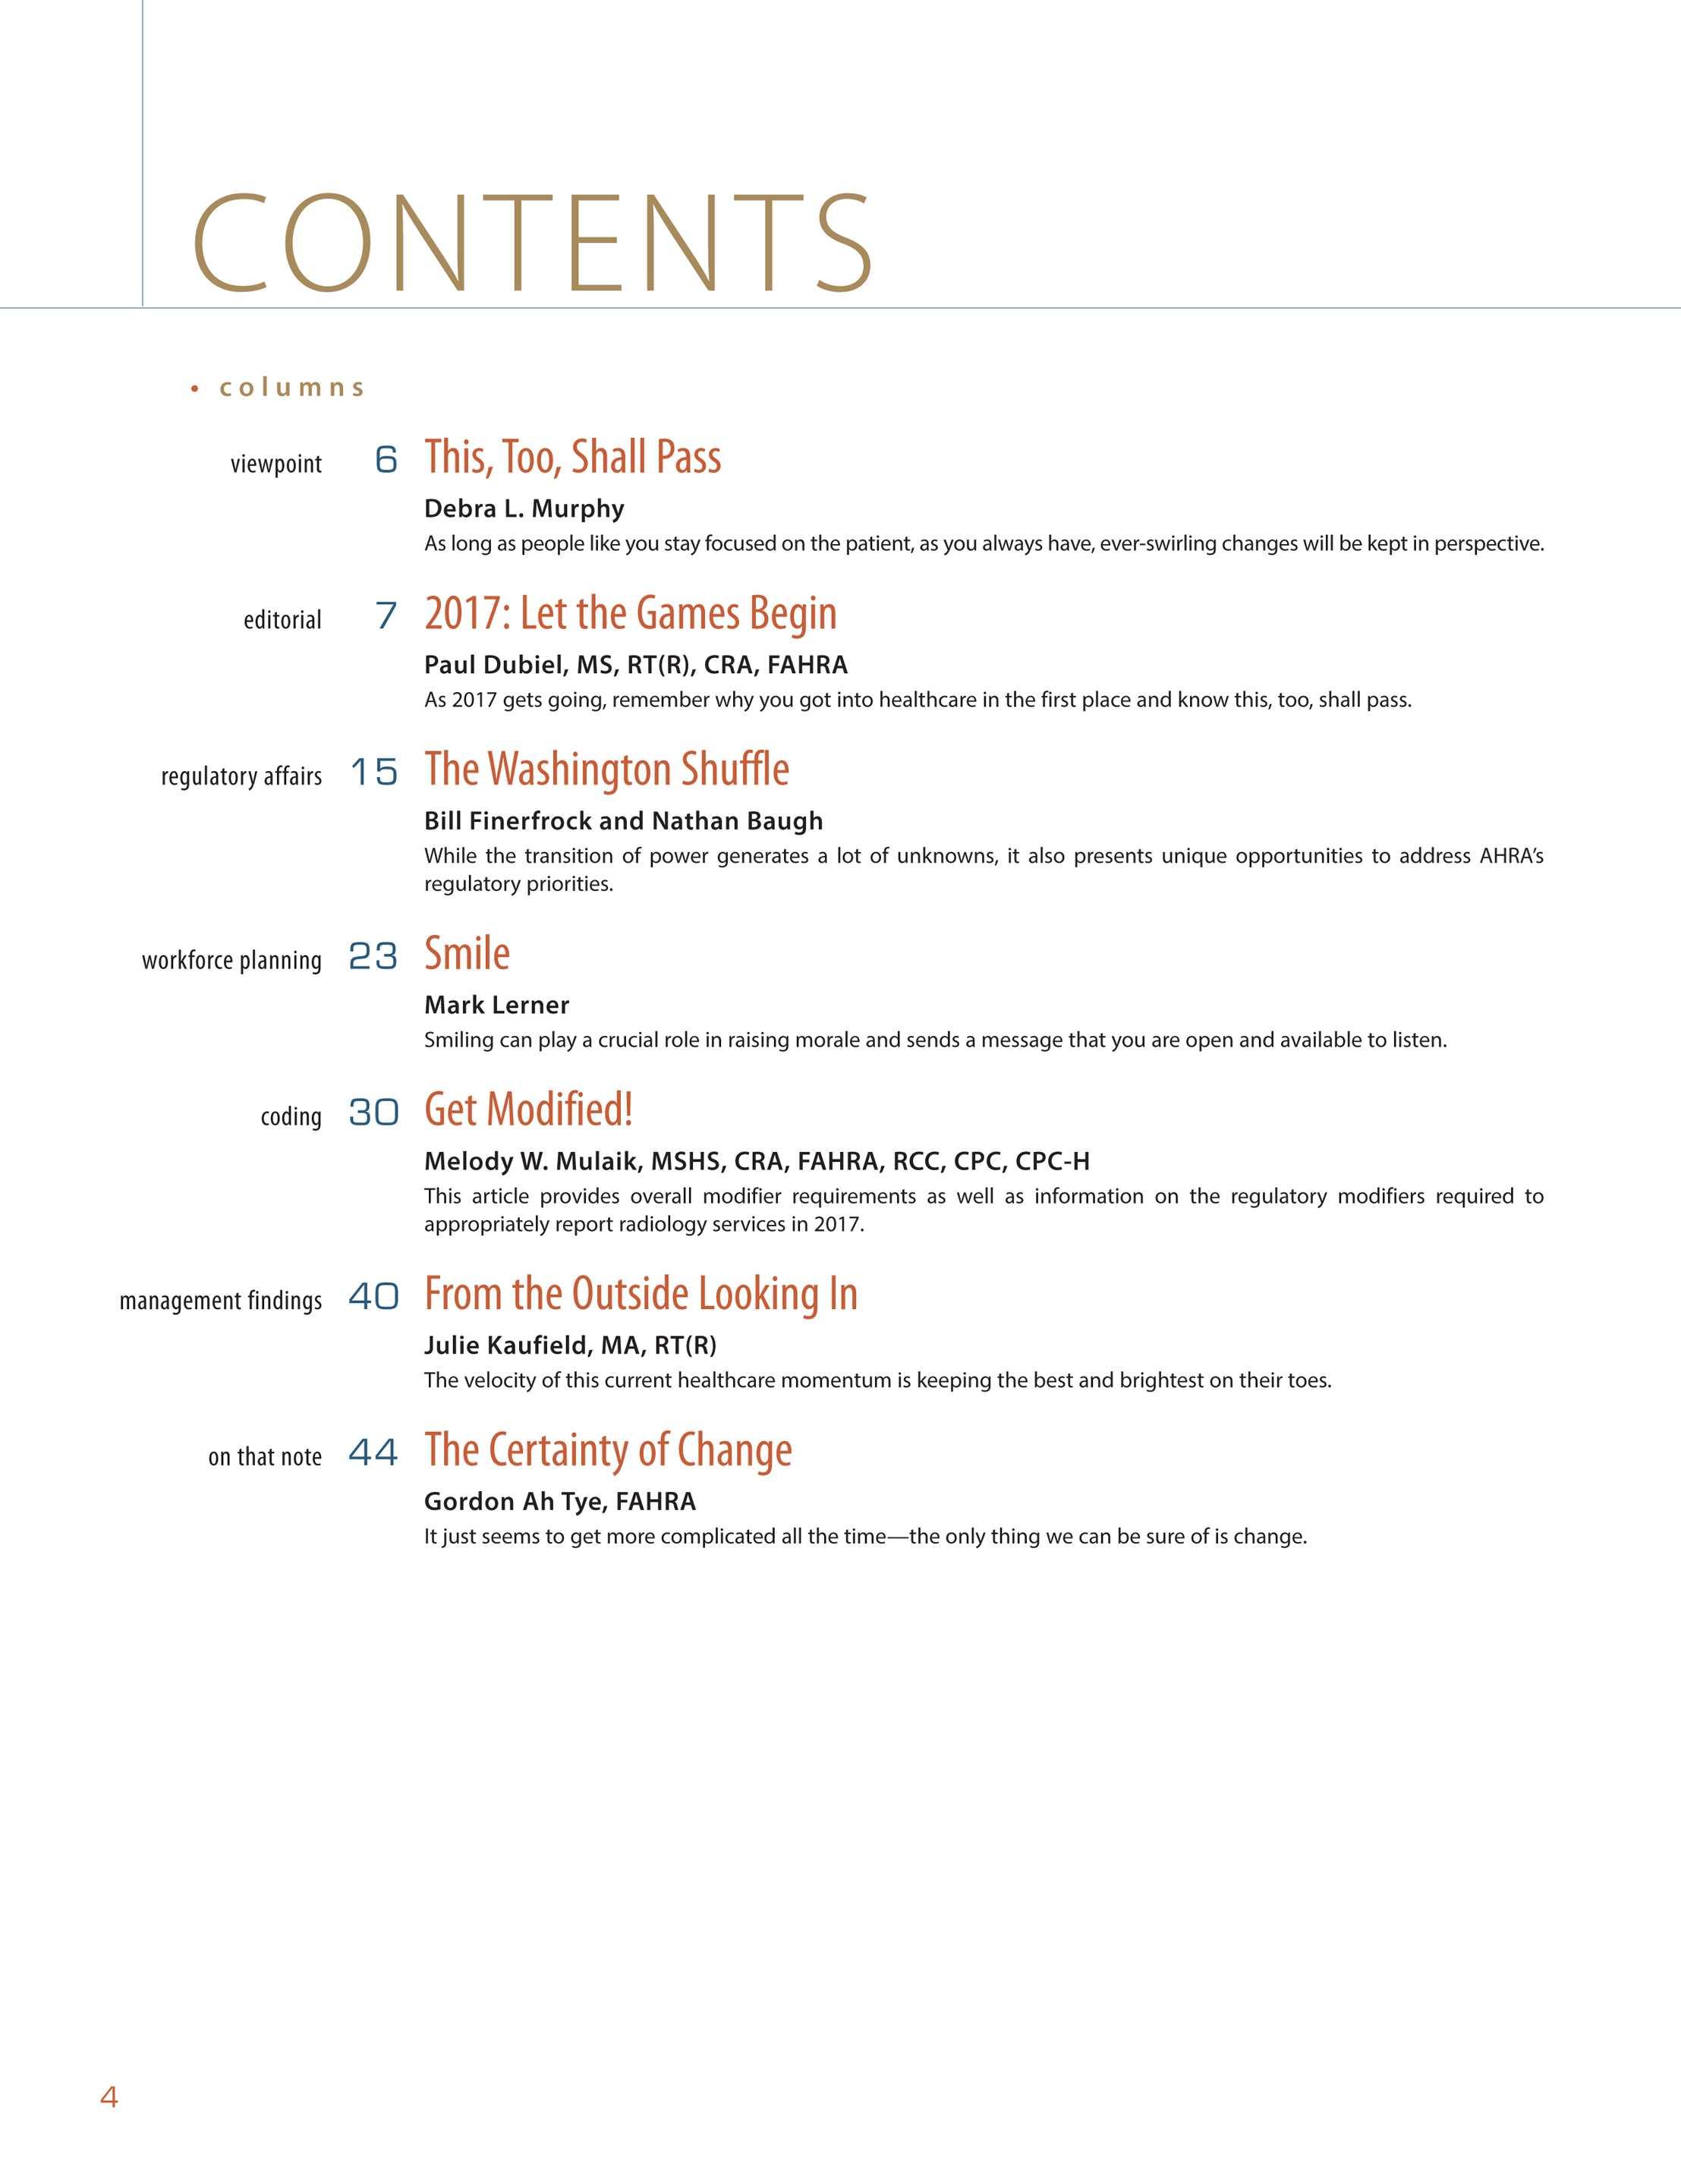 Radiology Management - January/February 2017 - page 3